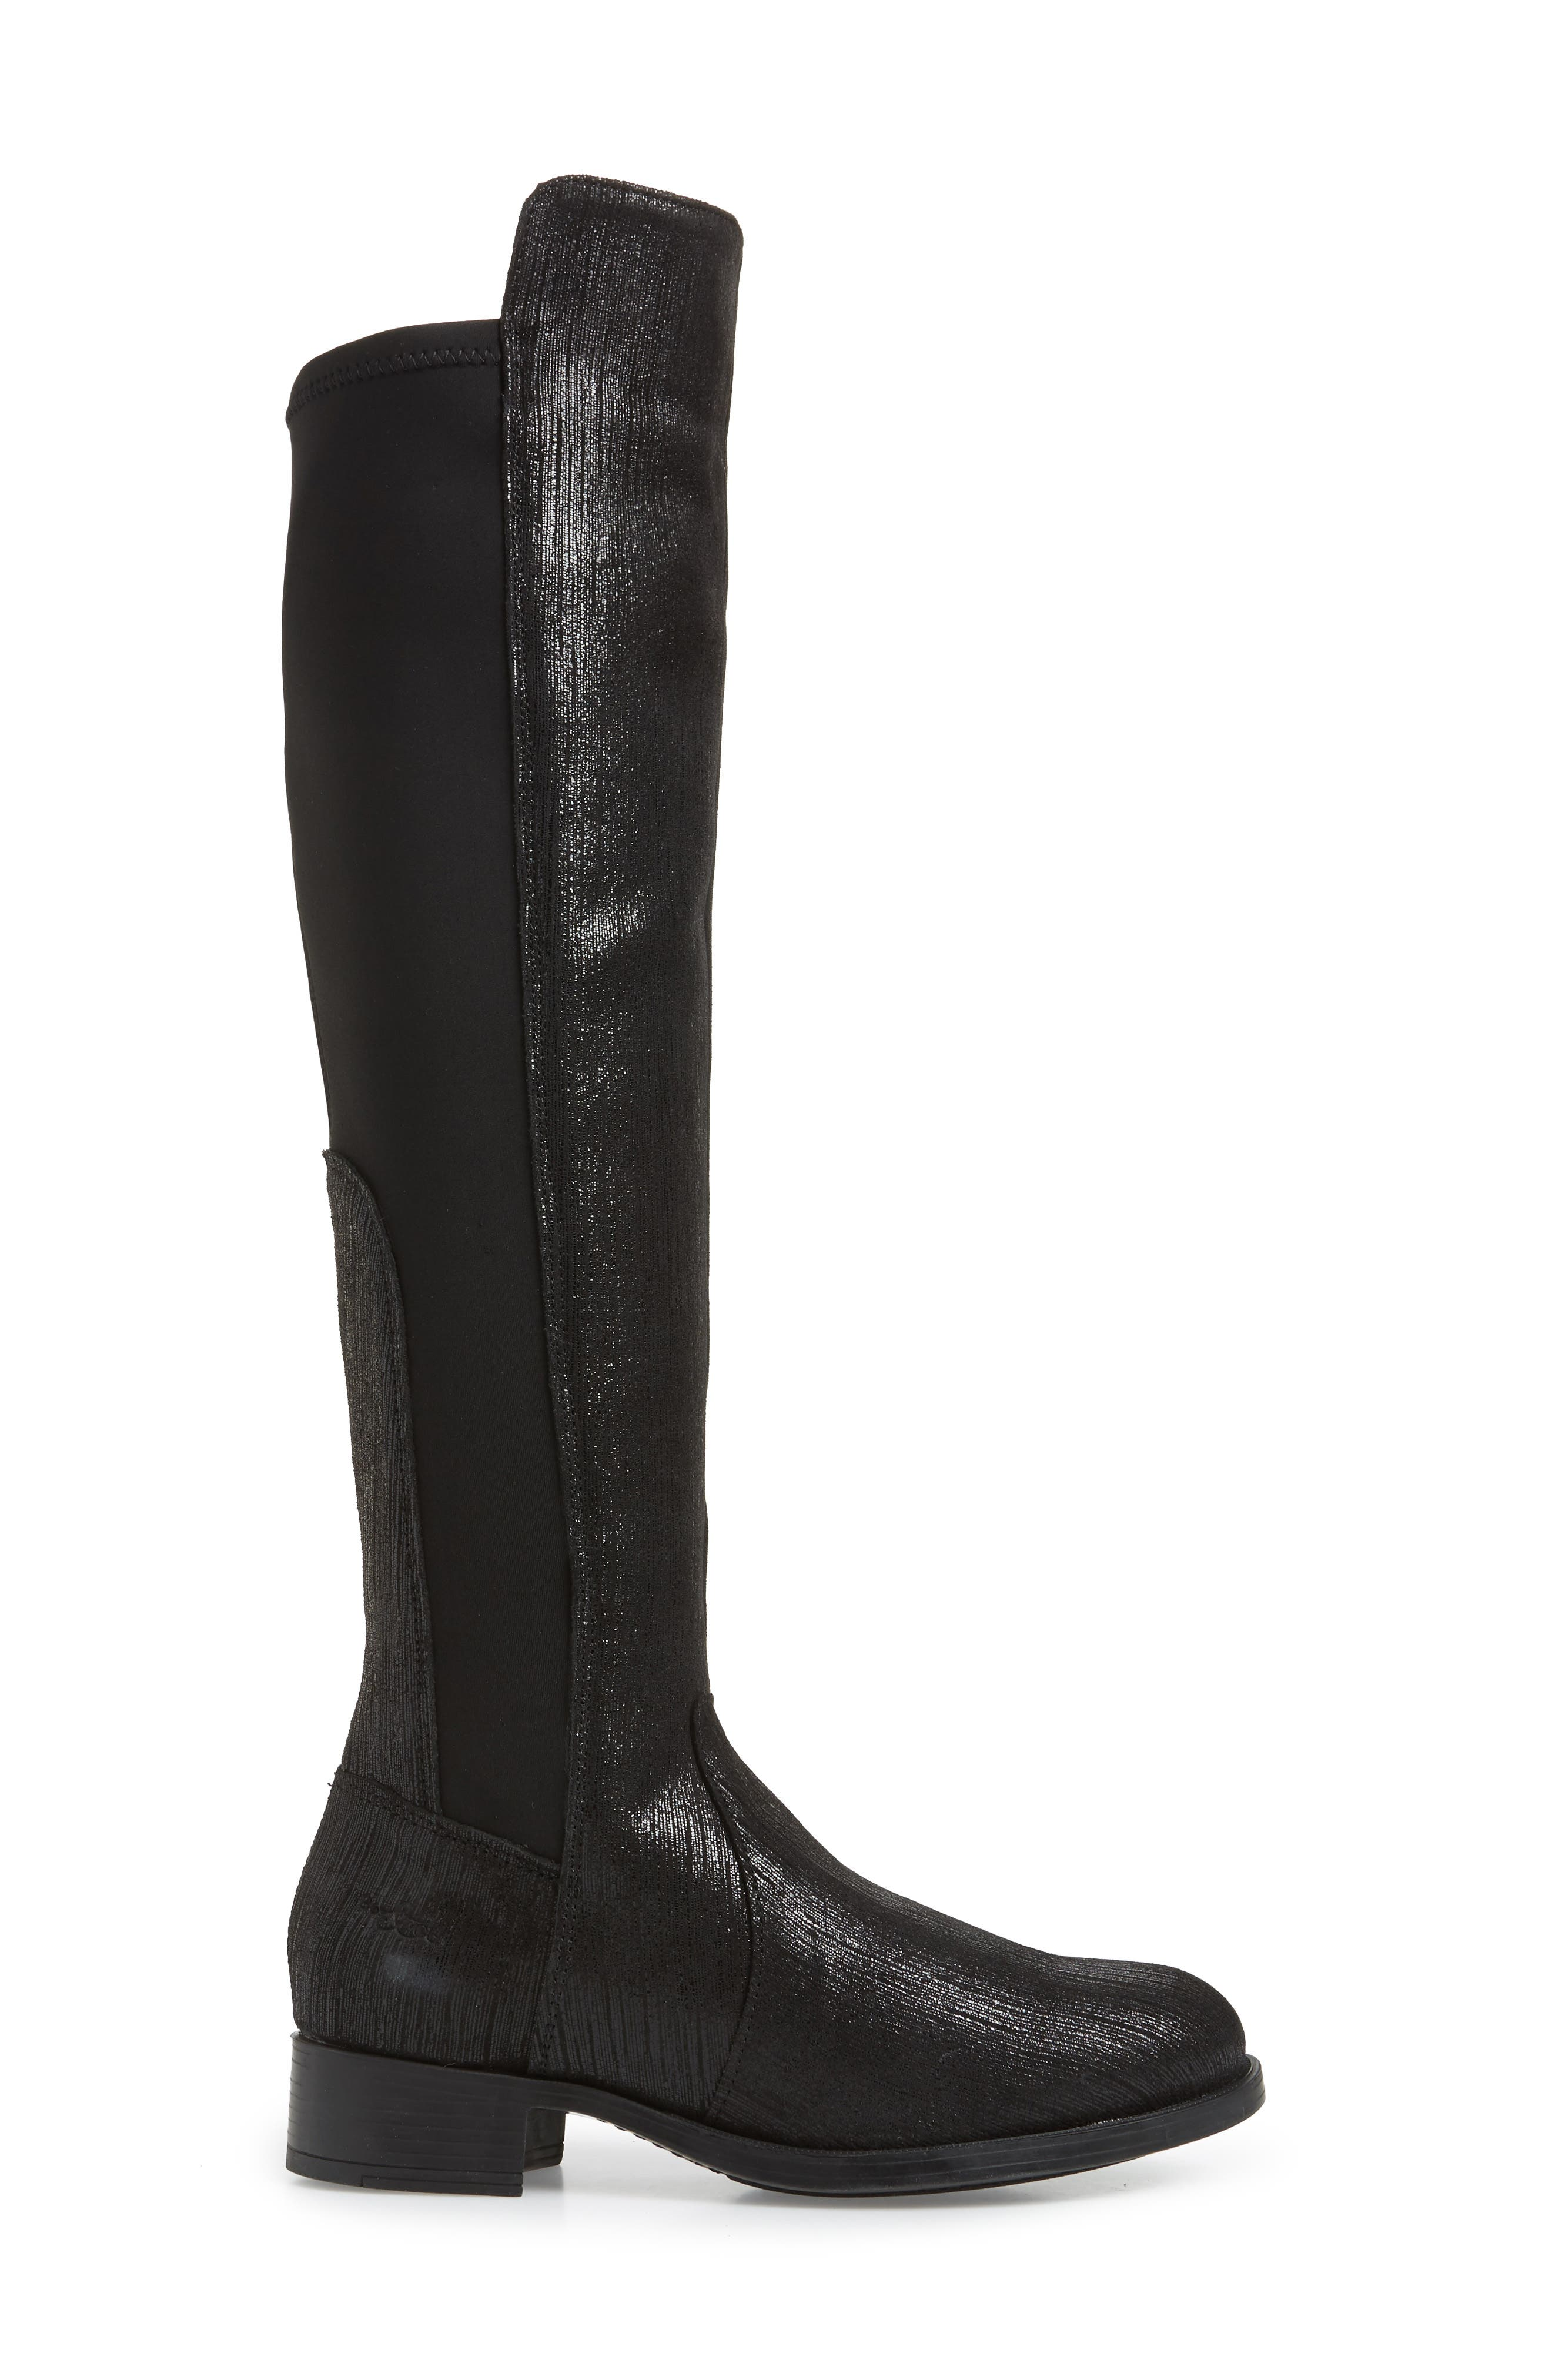 BOS. & CO., Bunt Waterproof Over the Knee Boot, Alternate thumbnail 3, color, BLACK METAL/ LYCRA